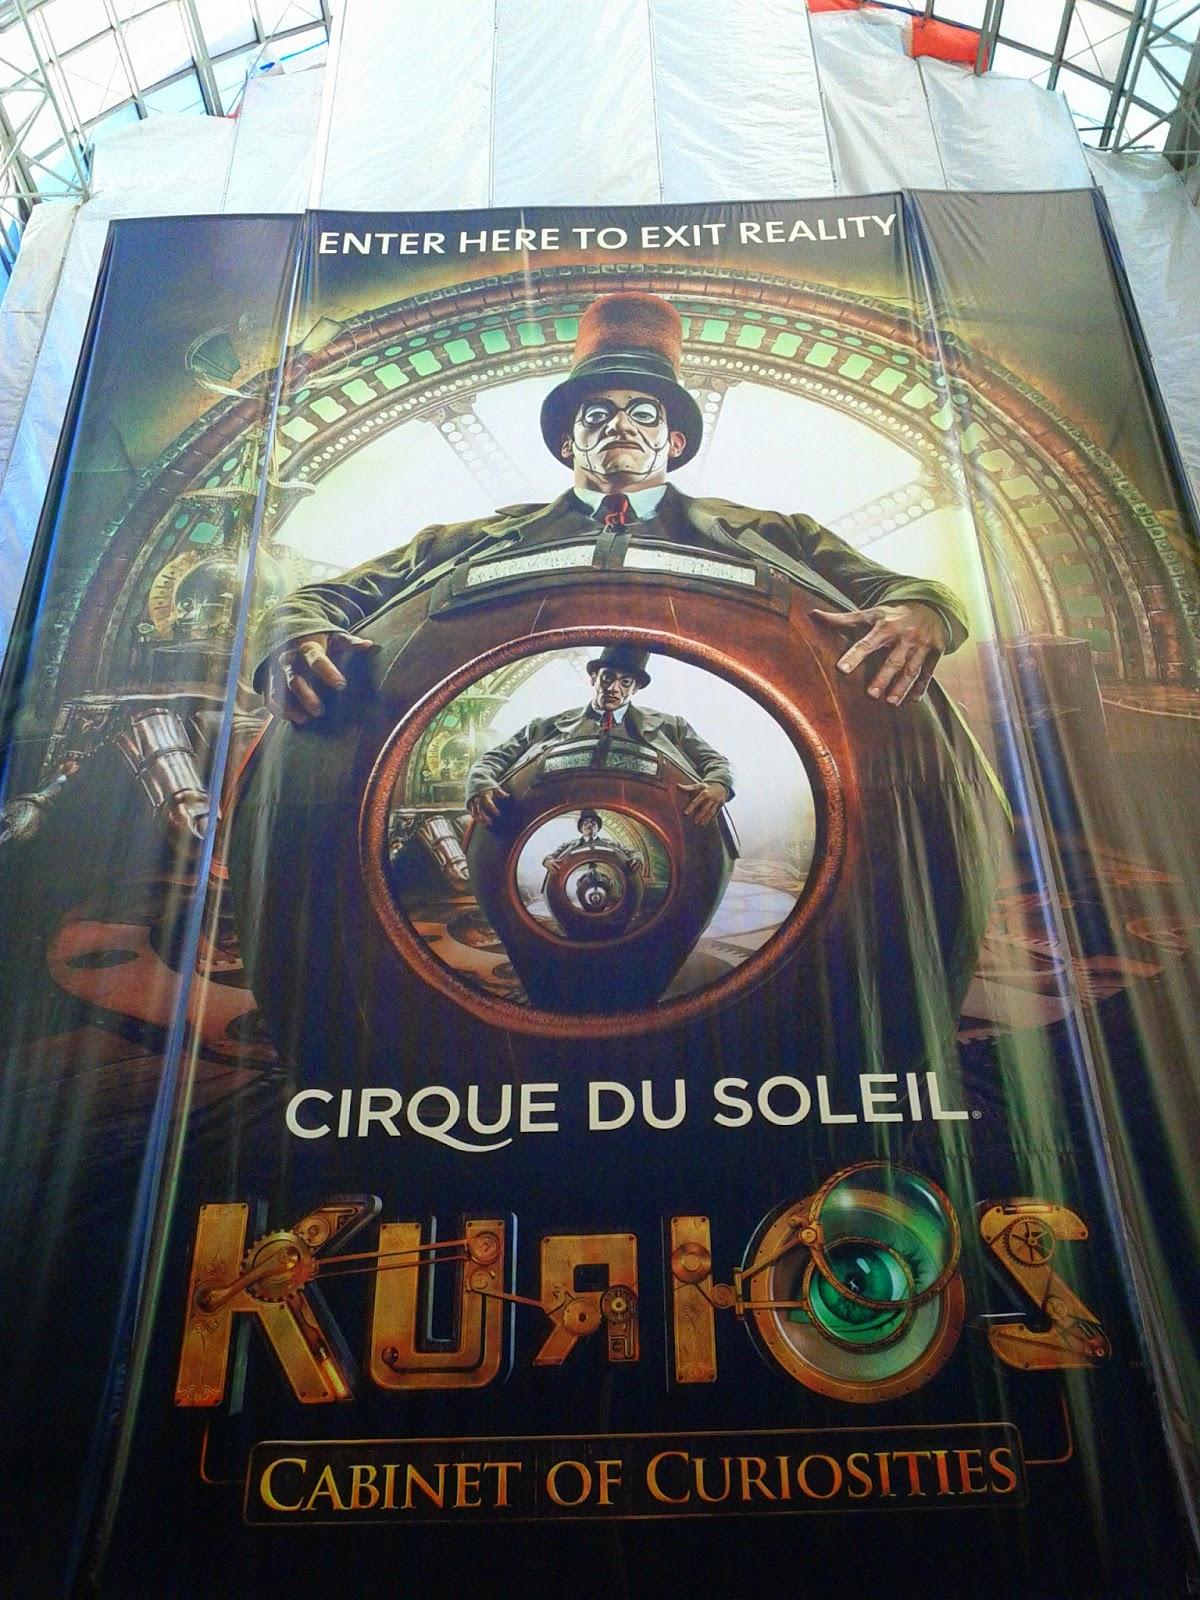 Circue Du Soleil Kurios Cabinet of Curiosities poster